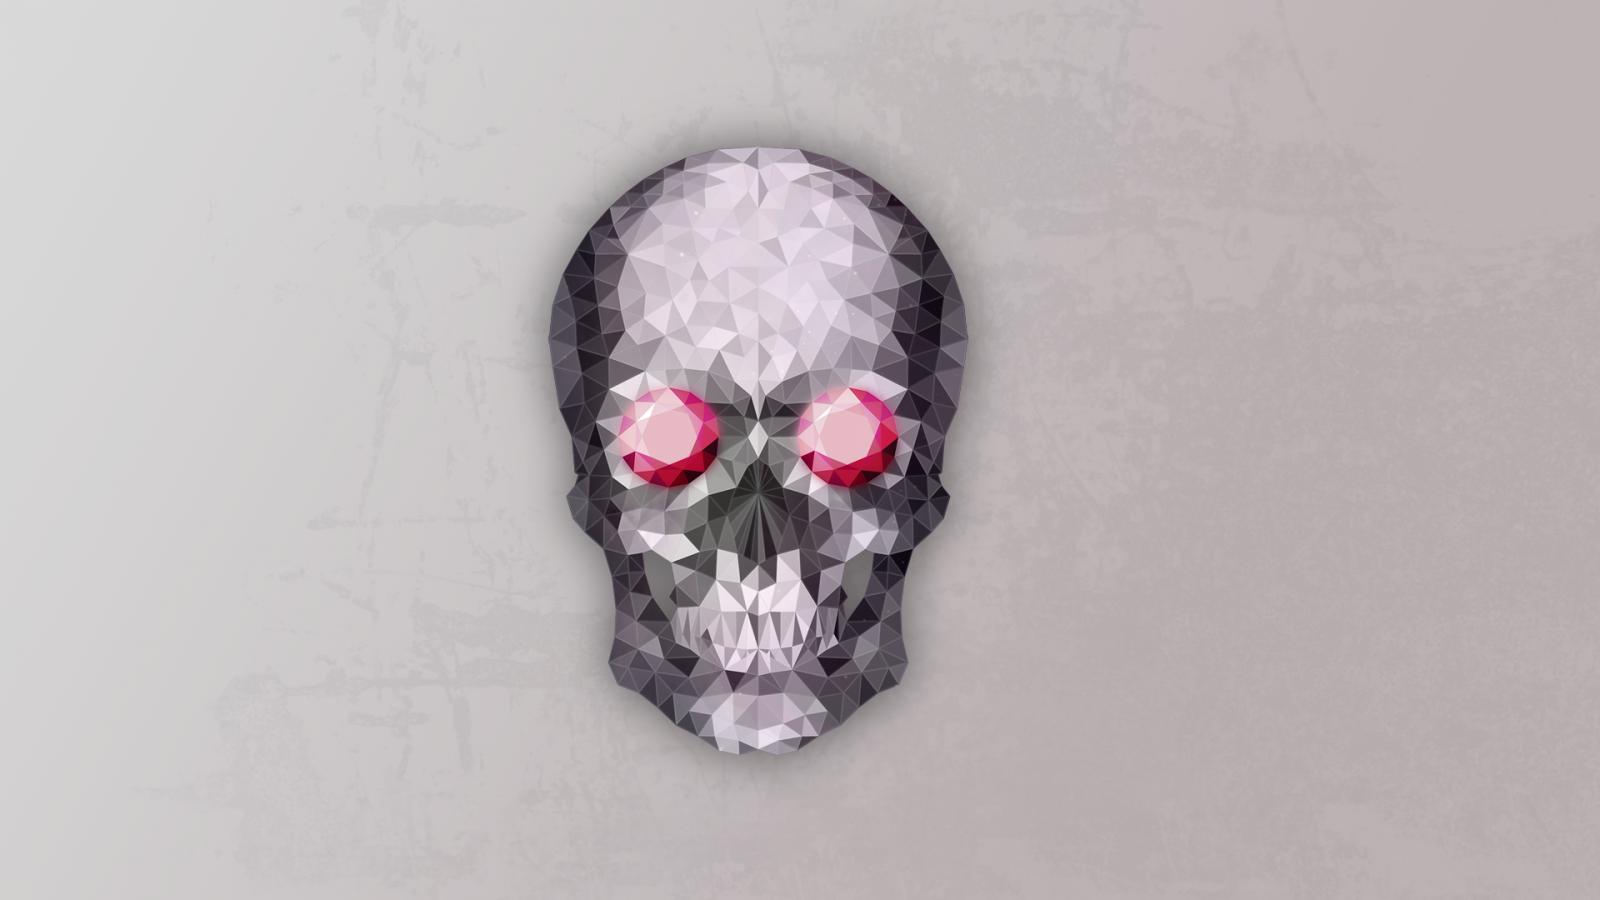 Wallpaper Gambar Putih Seni Digital Latar Belakang Yang